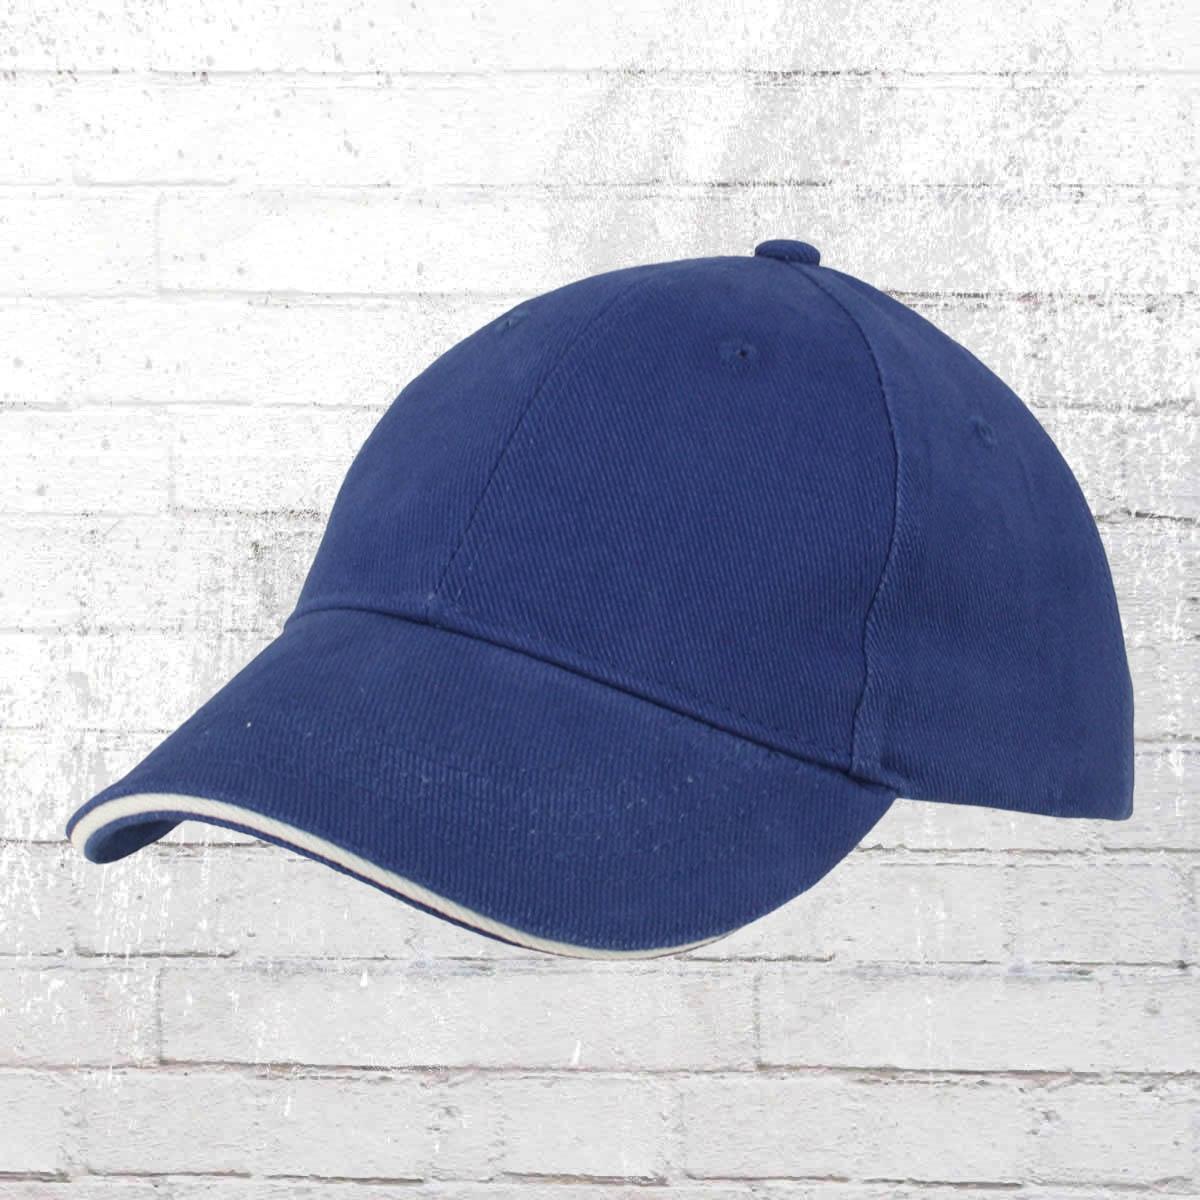 Myrtle Beach Blanko Sandwich Cap blau weiss